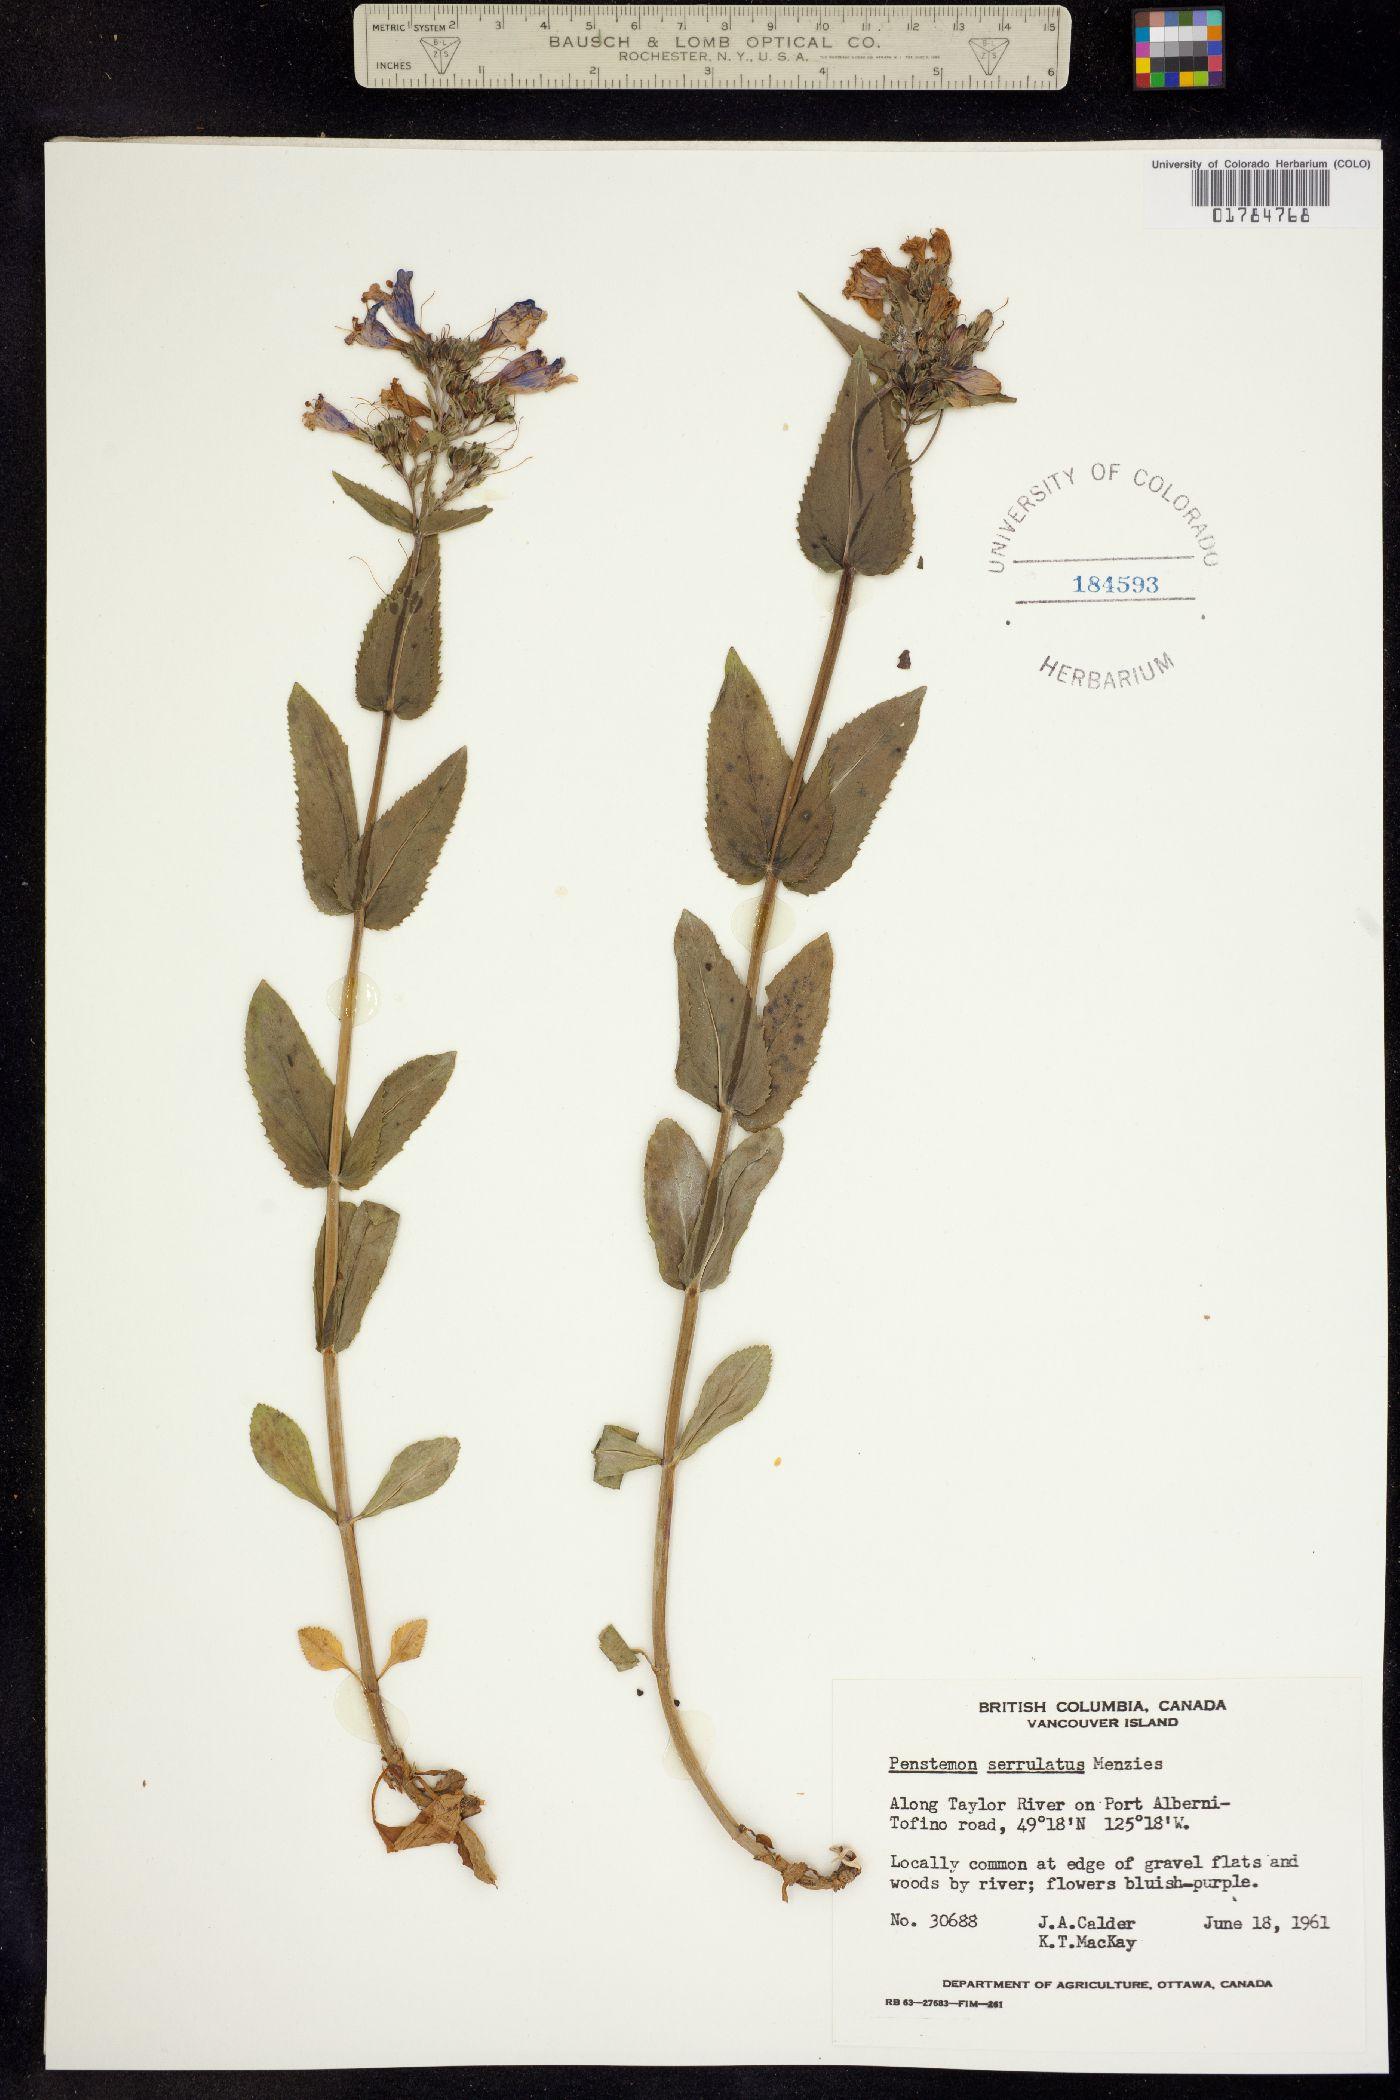 Penstemon serrulatus image